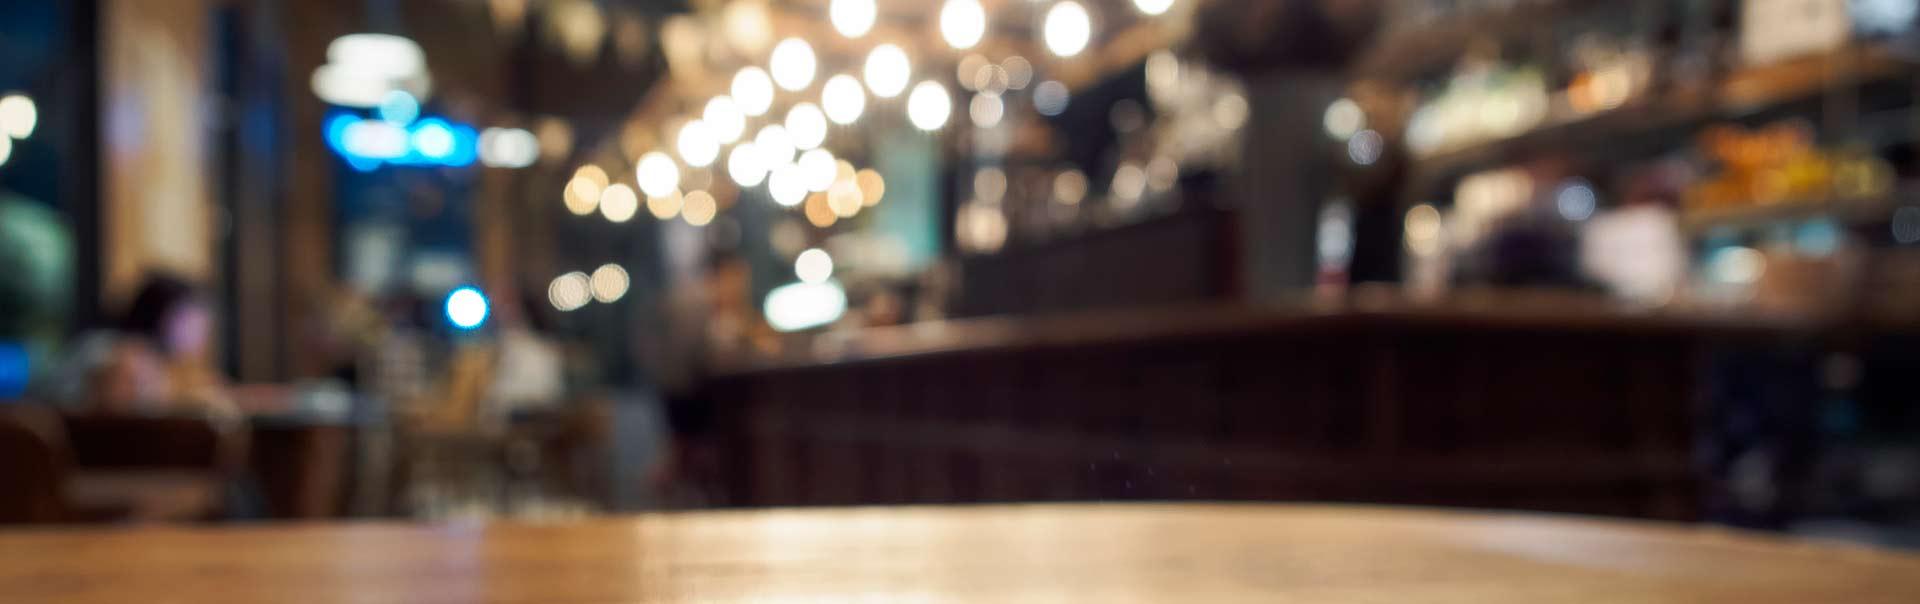 How to Get More Restaurant Reviews